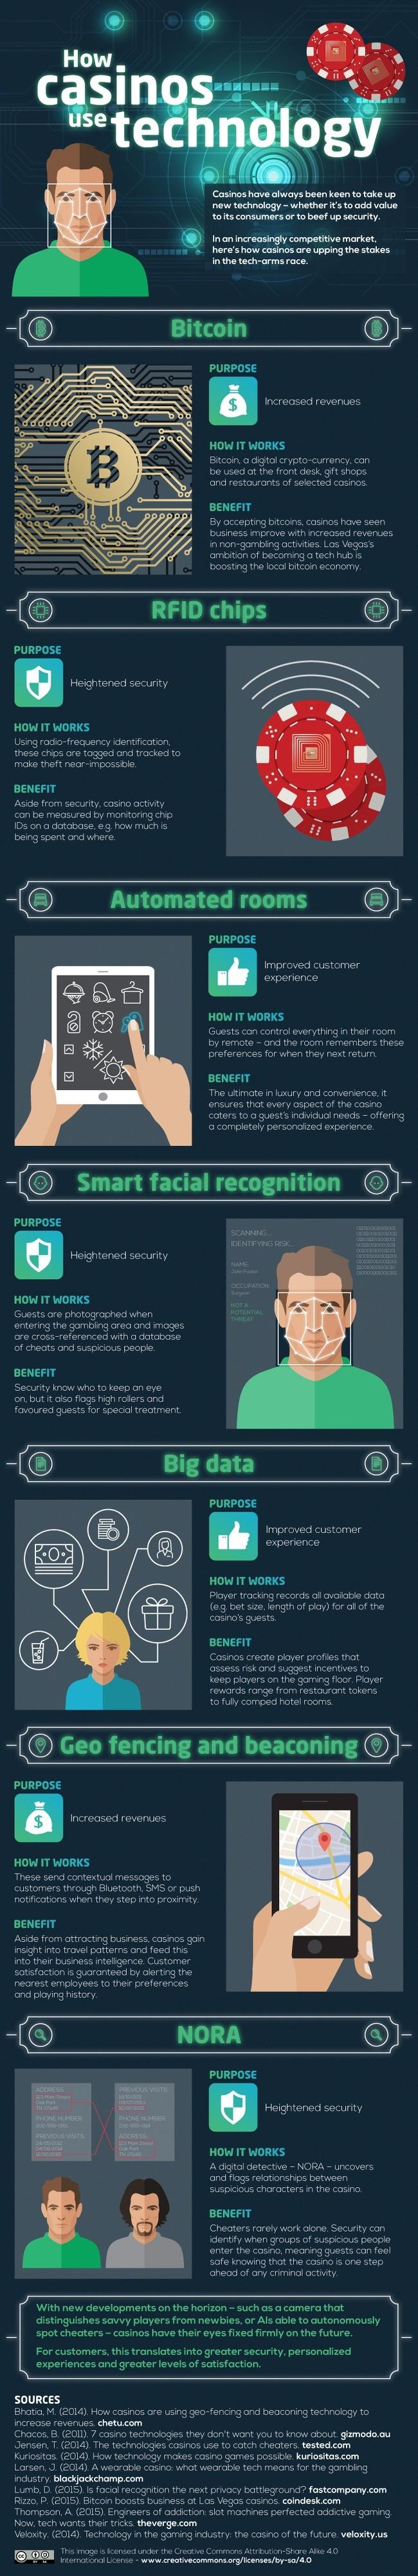 How casinos use technology | Casino technology